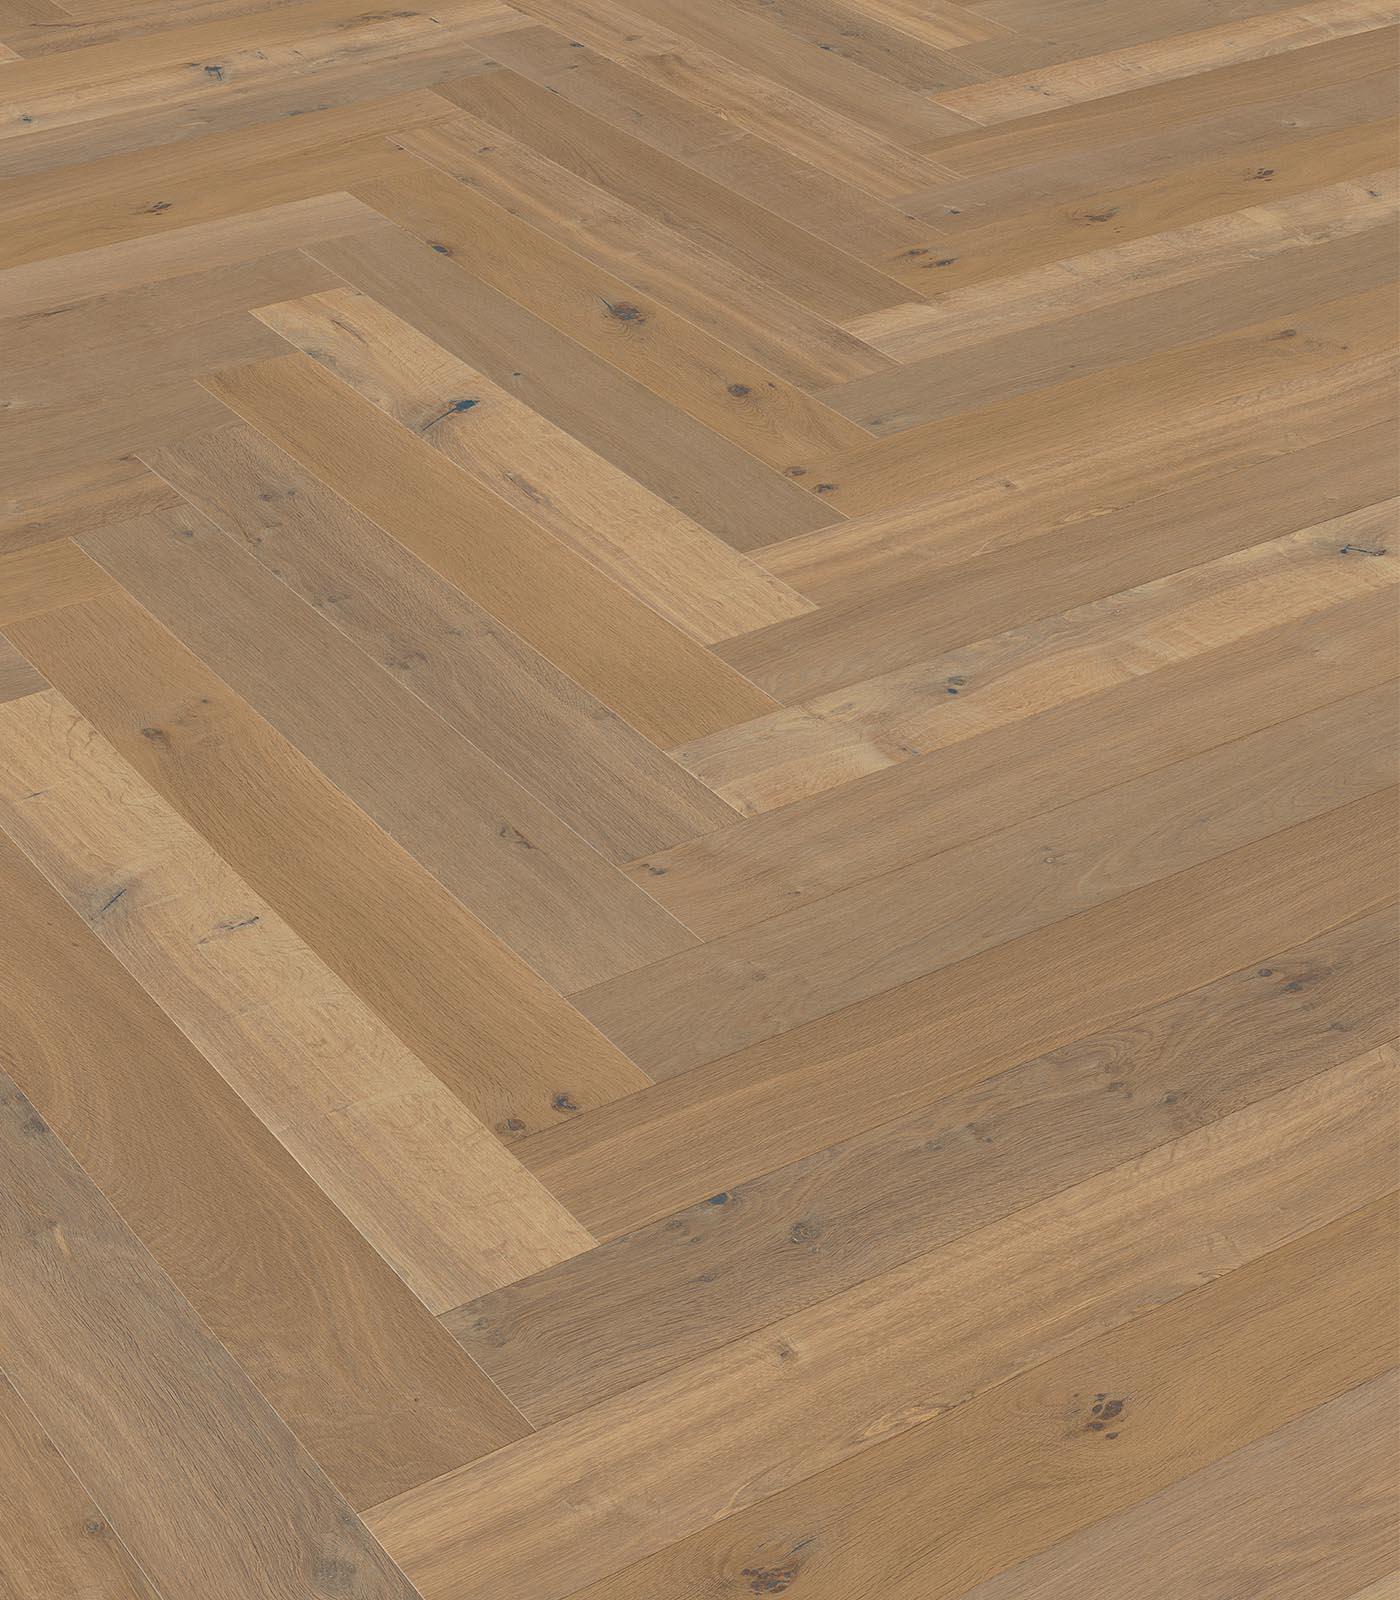 Fashion Collection-Herringbone-St Moritz-Western European oak flooring-angle